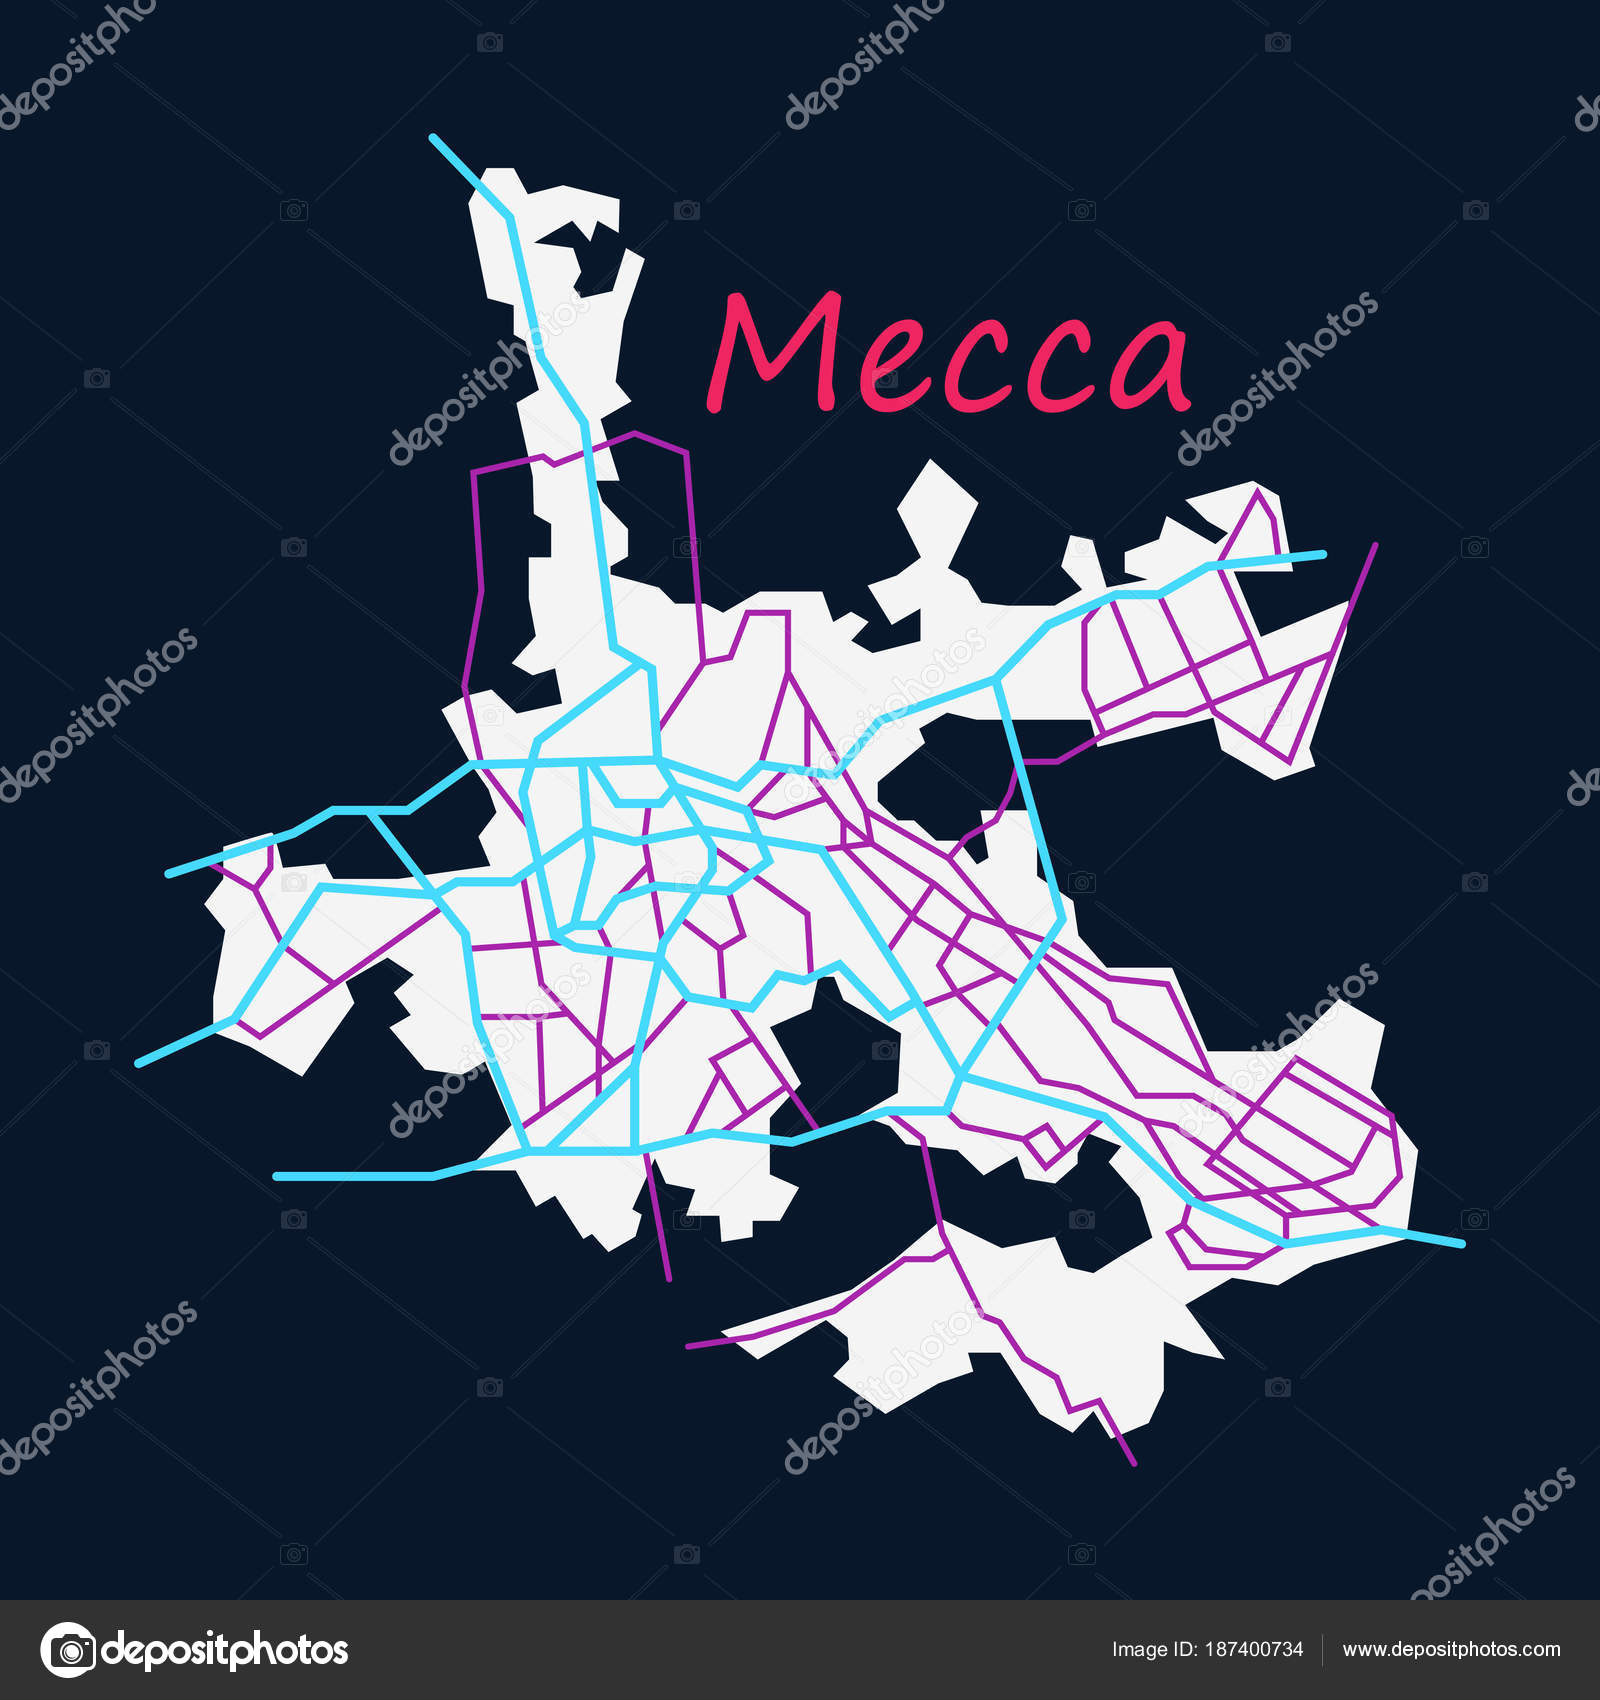 Mecca map Saudi Arabia, Flat illustration. — Stock Vector ...